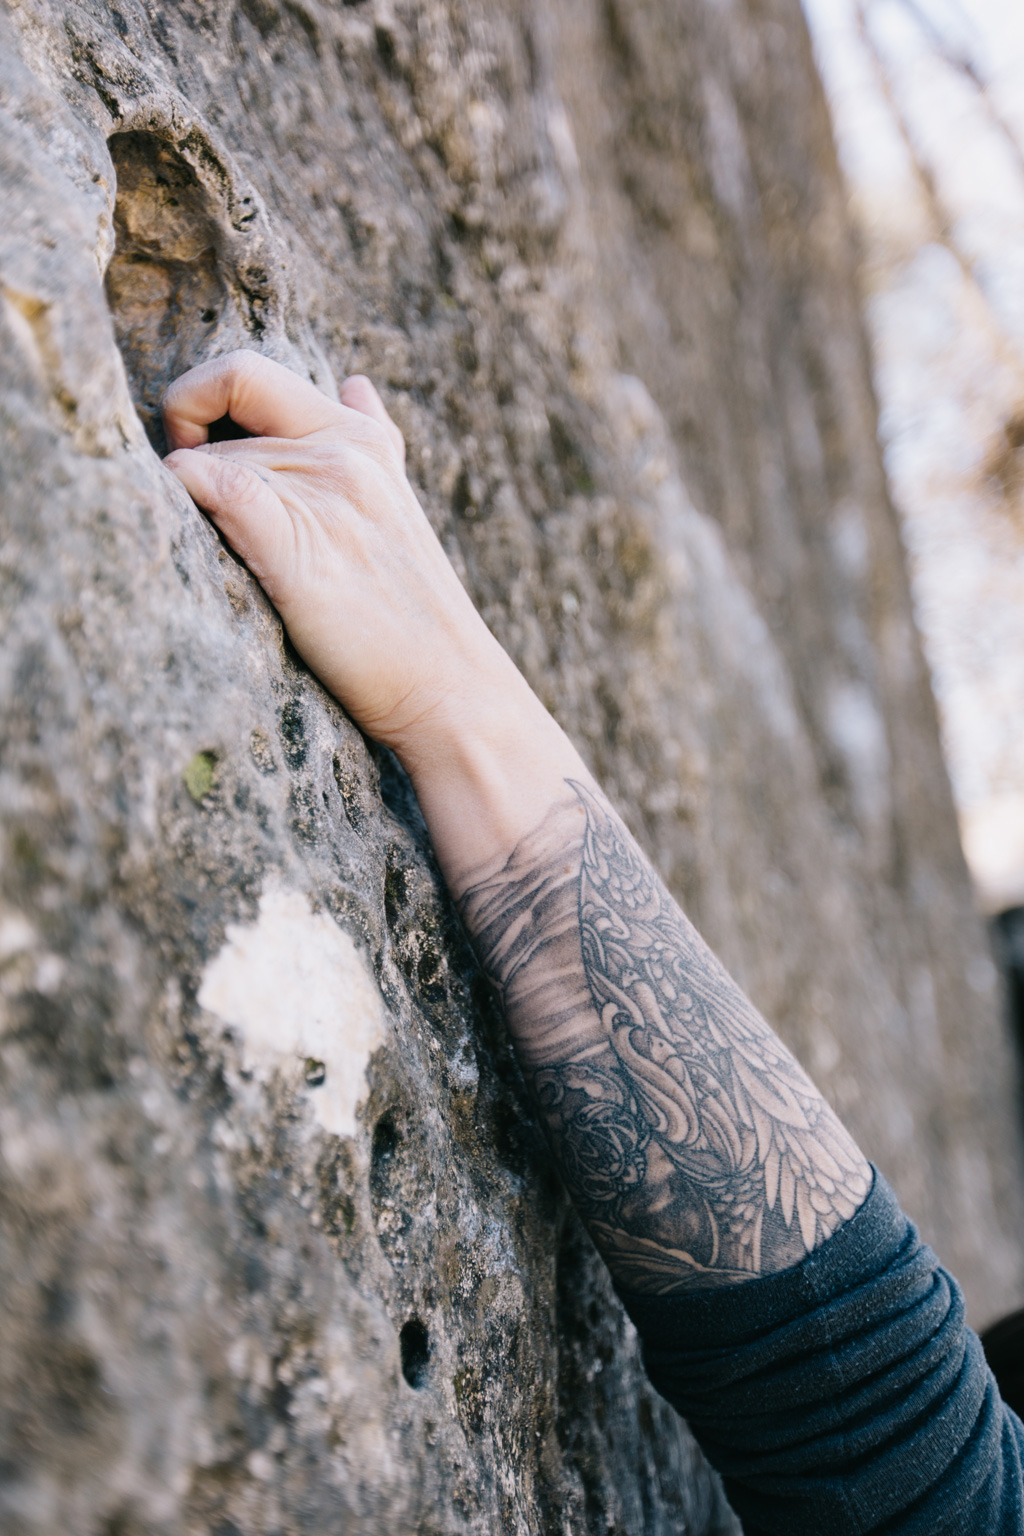 CindyGiovagnoli_photographer_outdoor_climbing_adventure_Texas_Austin_BullCreekPark_bouldering-015.jpg